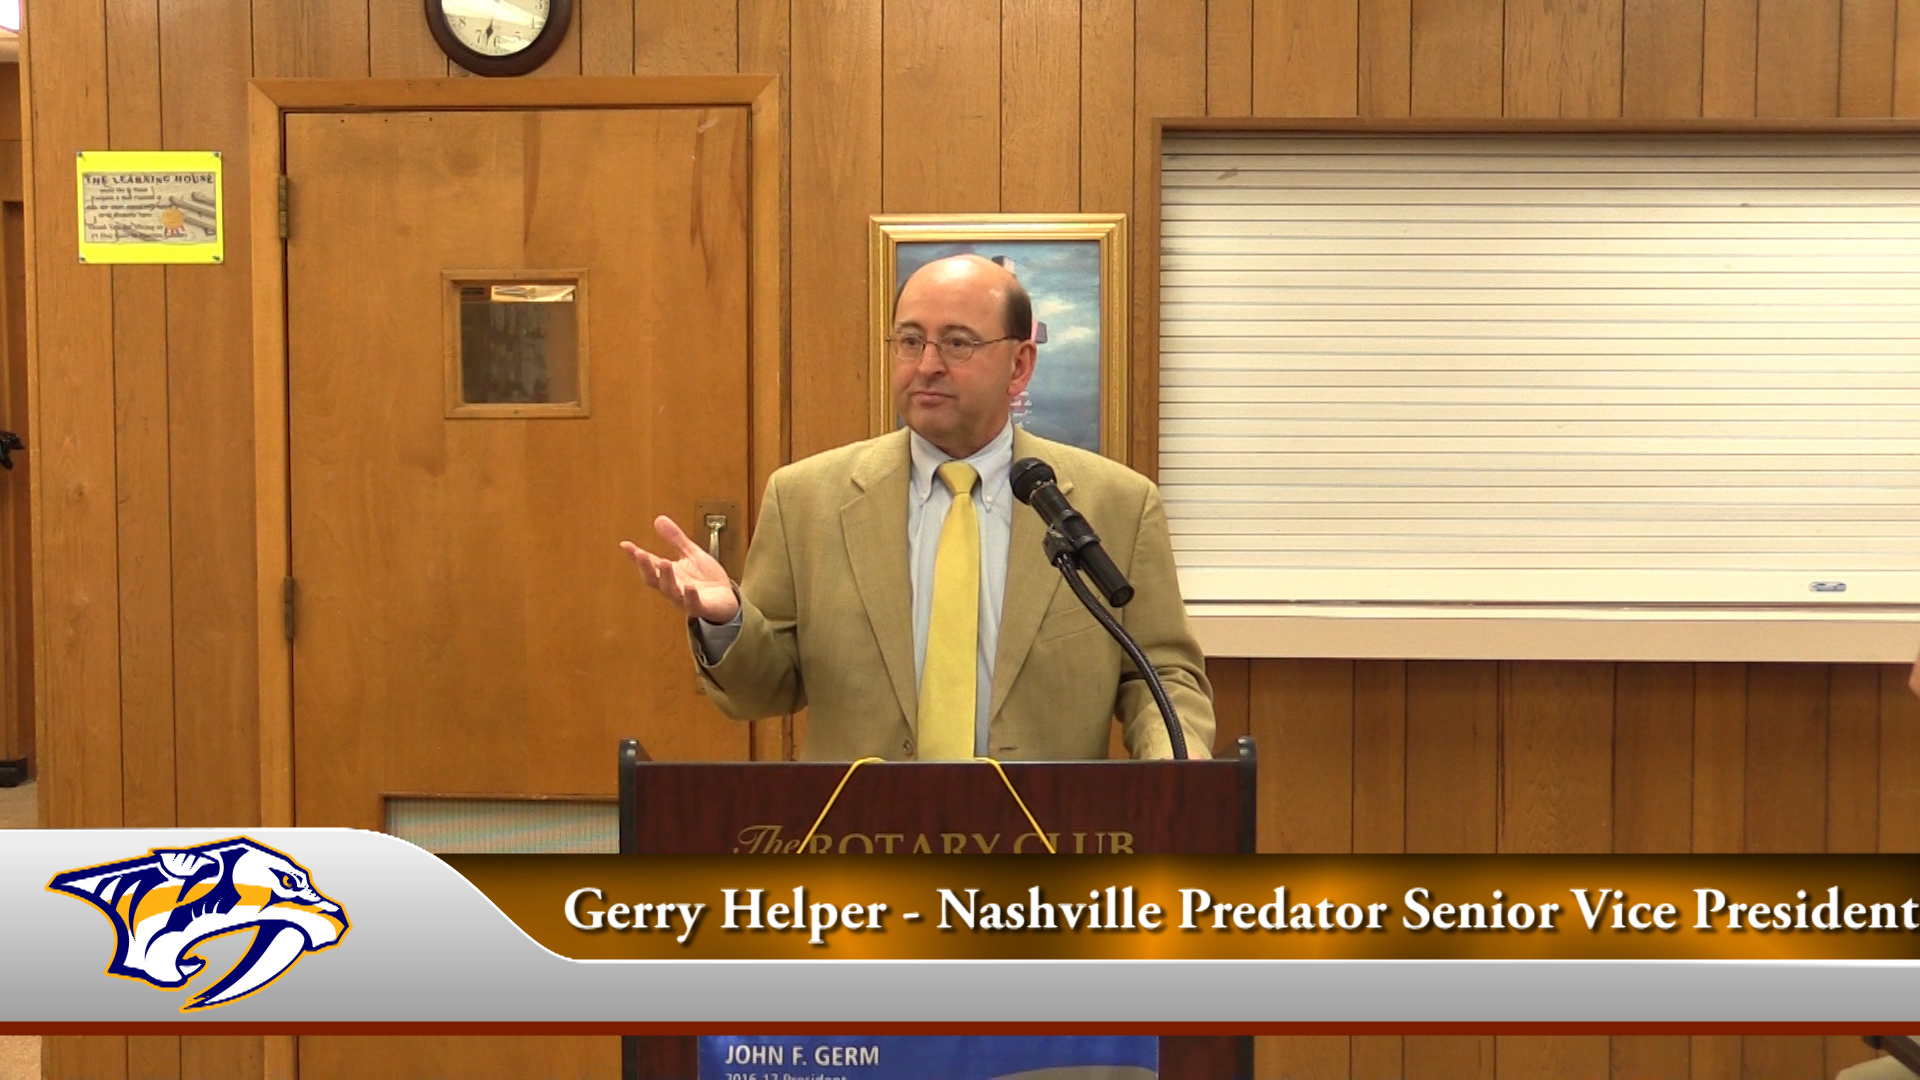 VIDEO: Nashville Predator VP speaks with Rotary